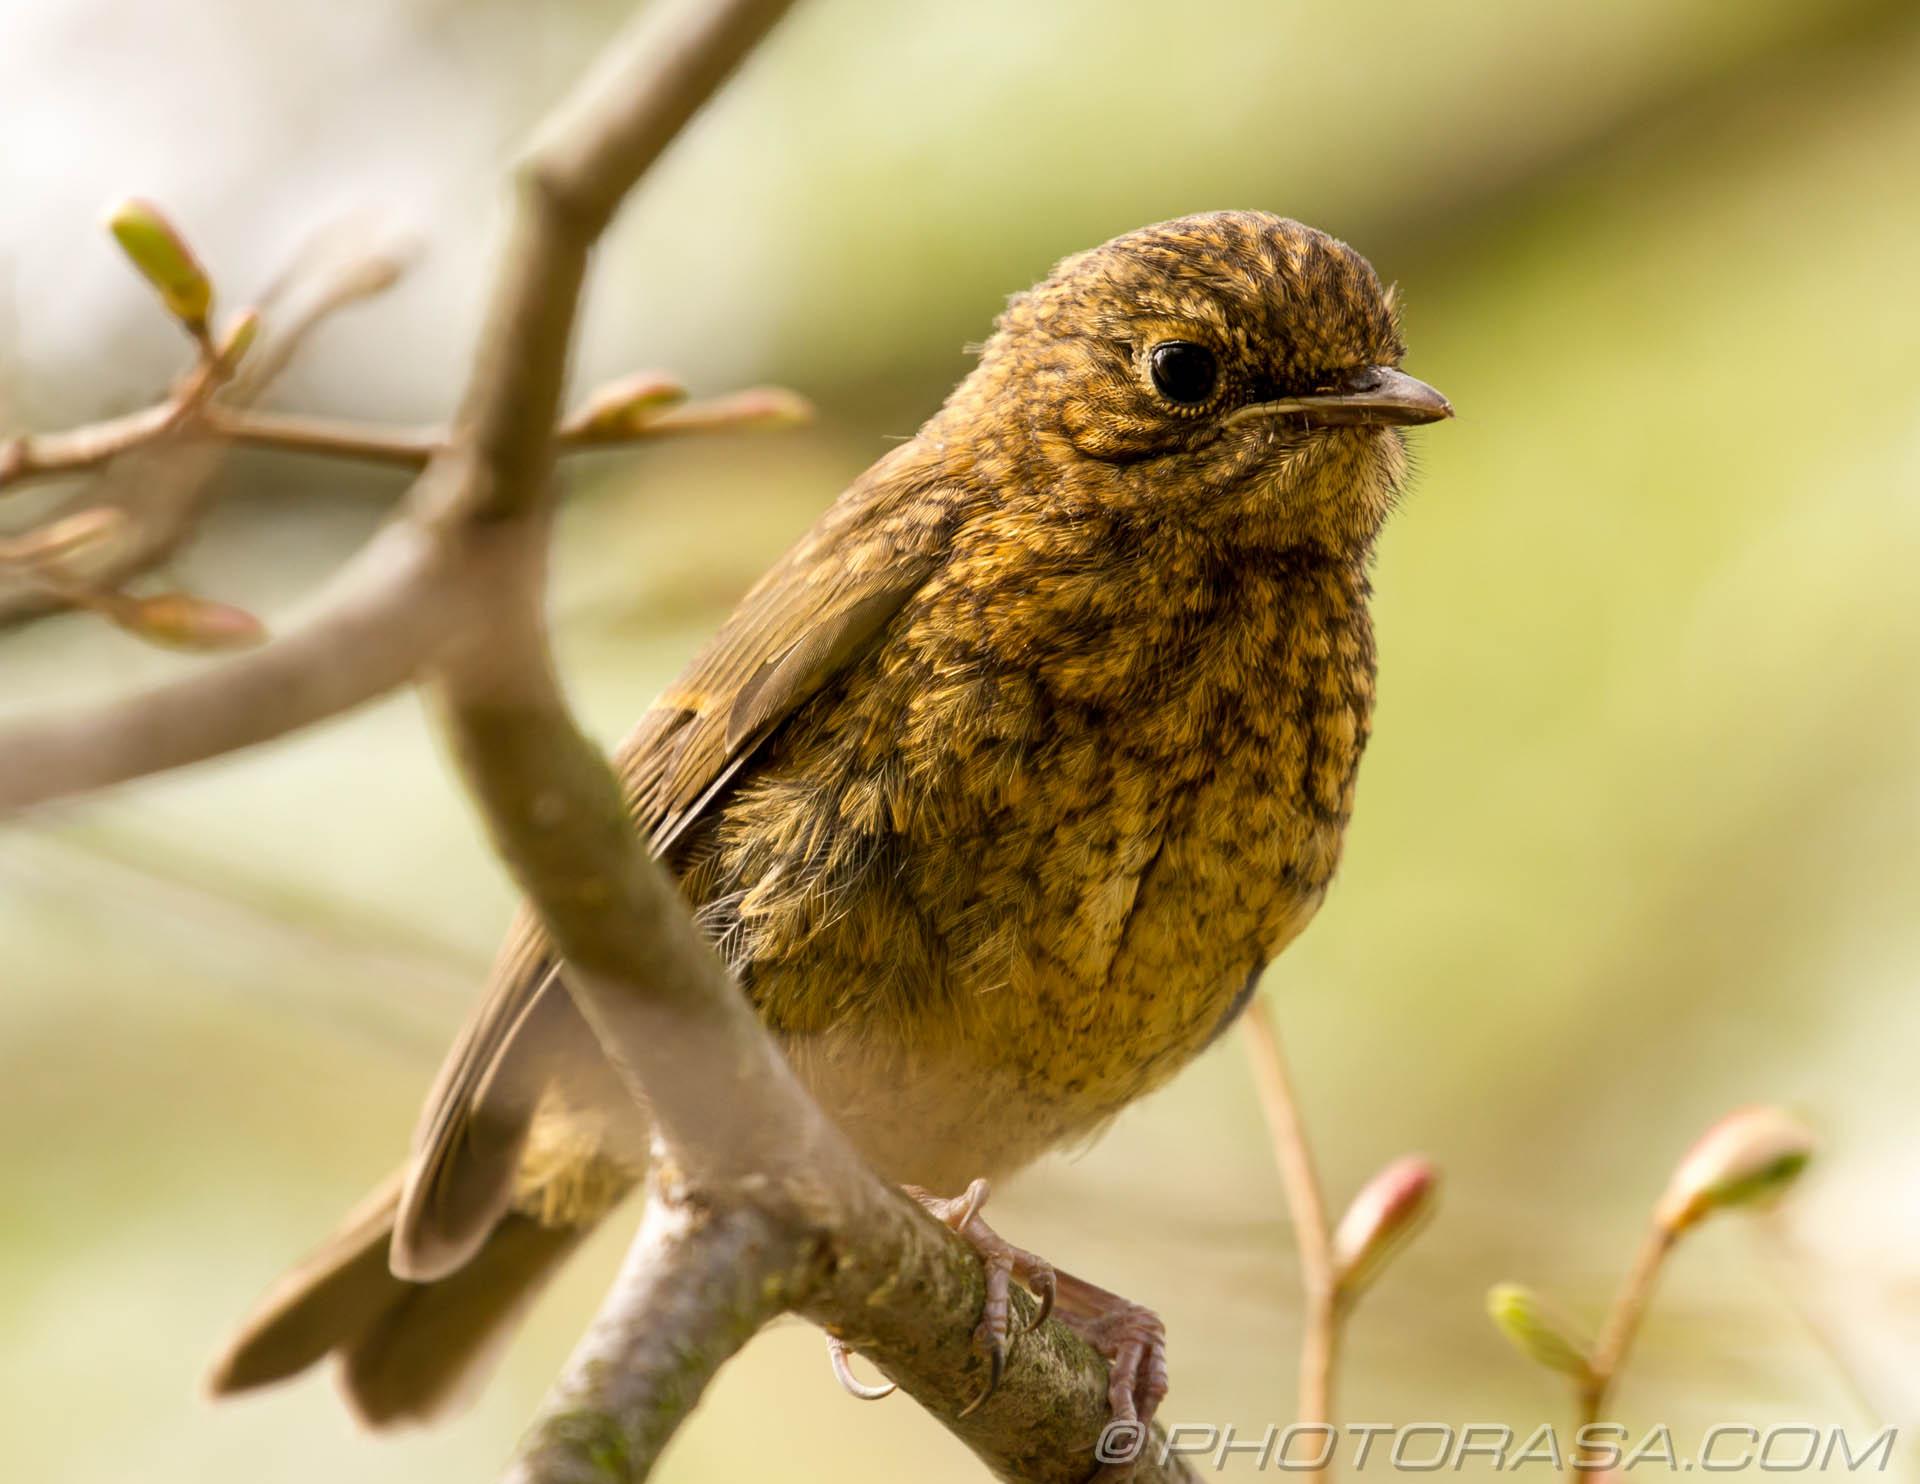 http://photorasa.com/young-robin-brown-orange/juvenile-on-a-branch/